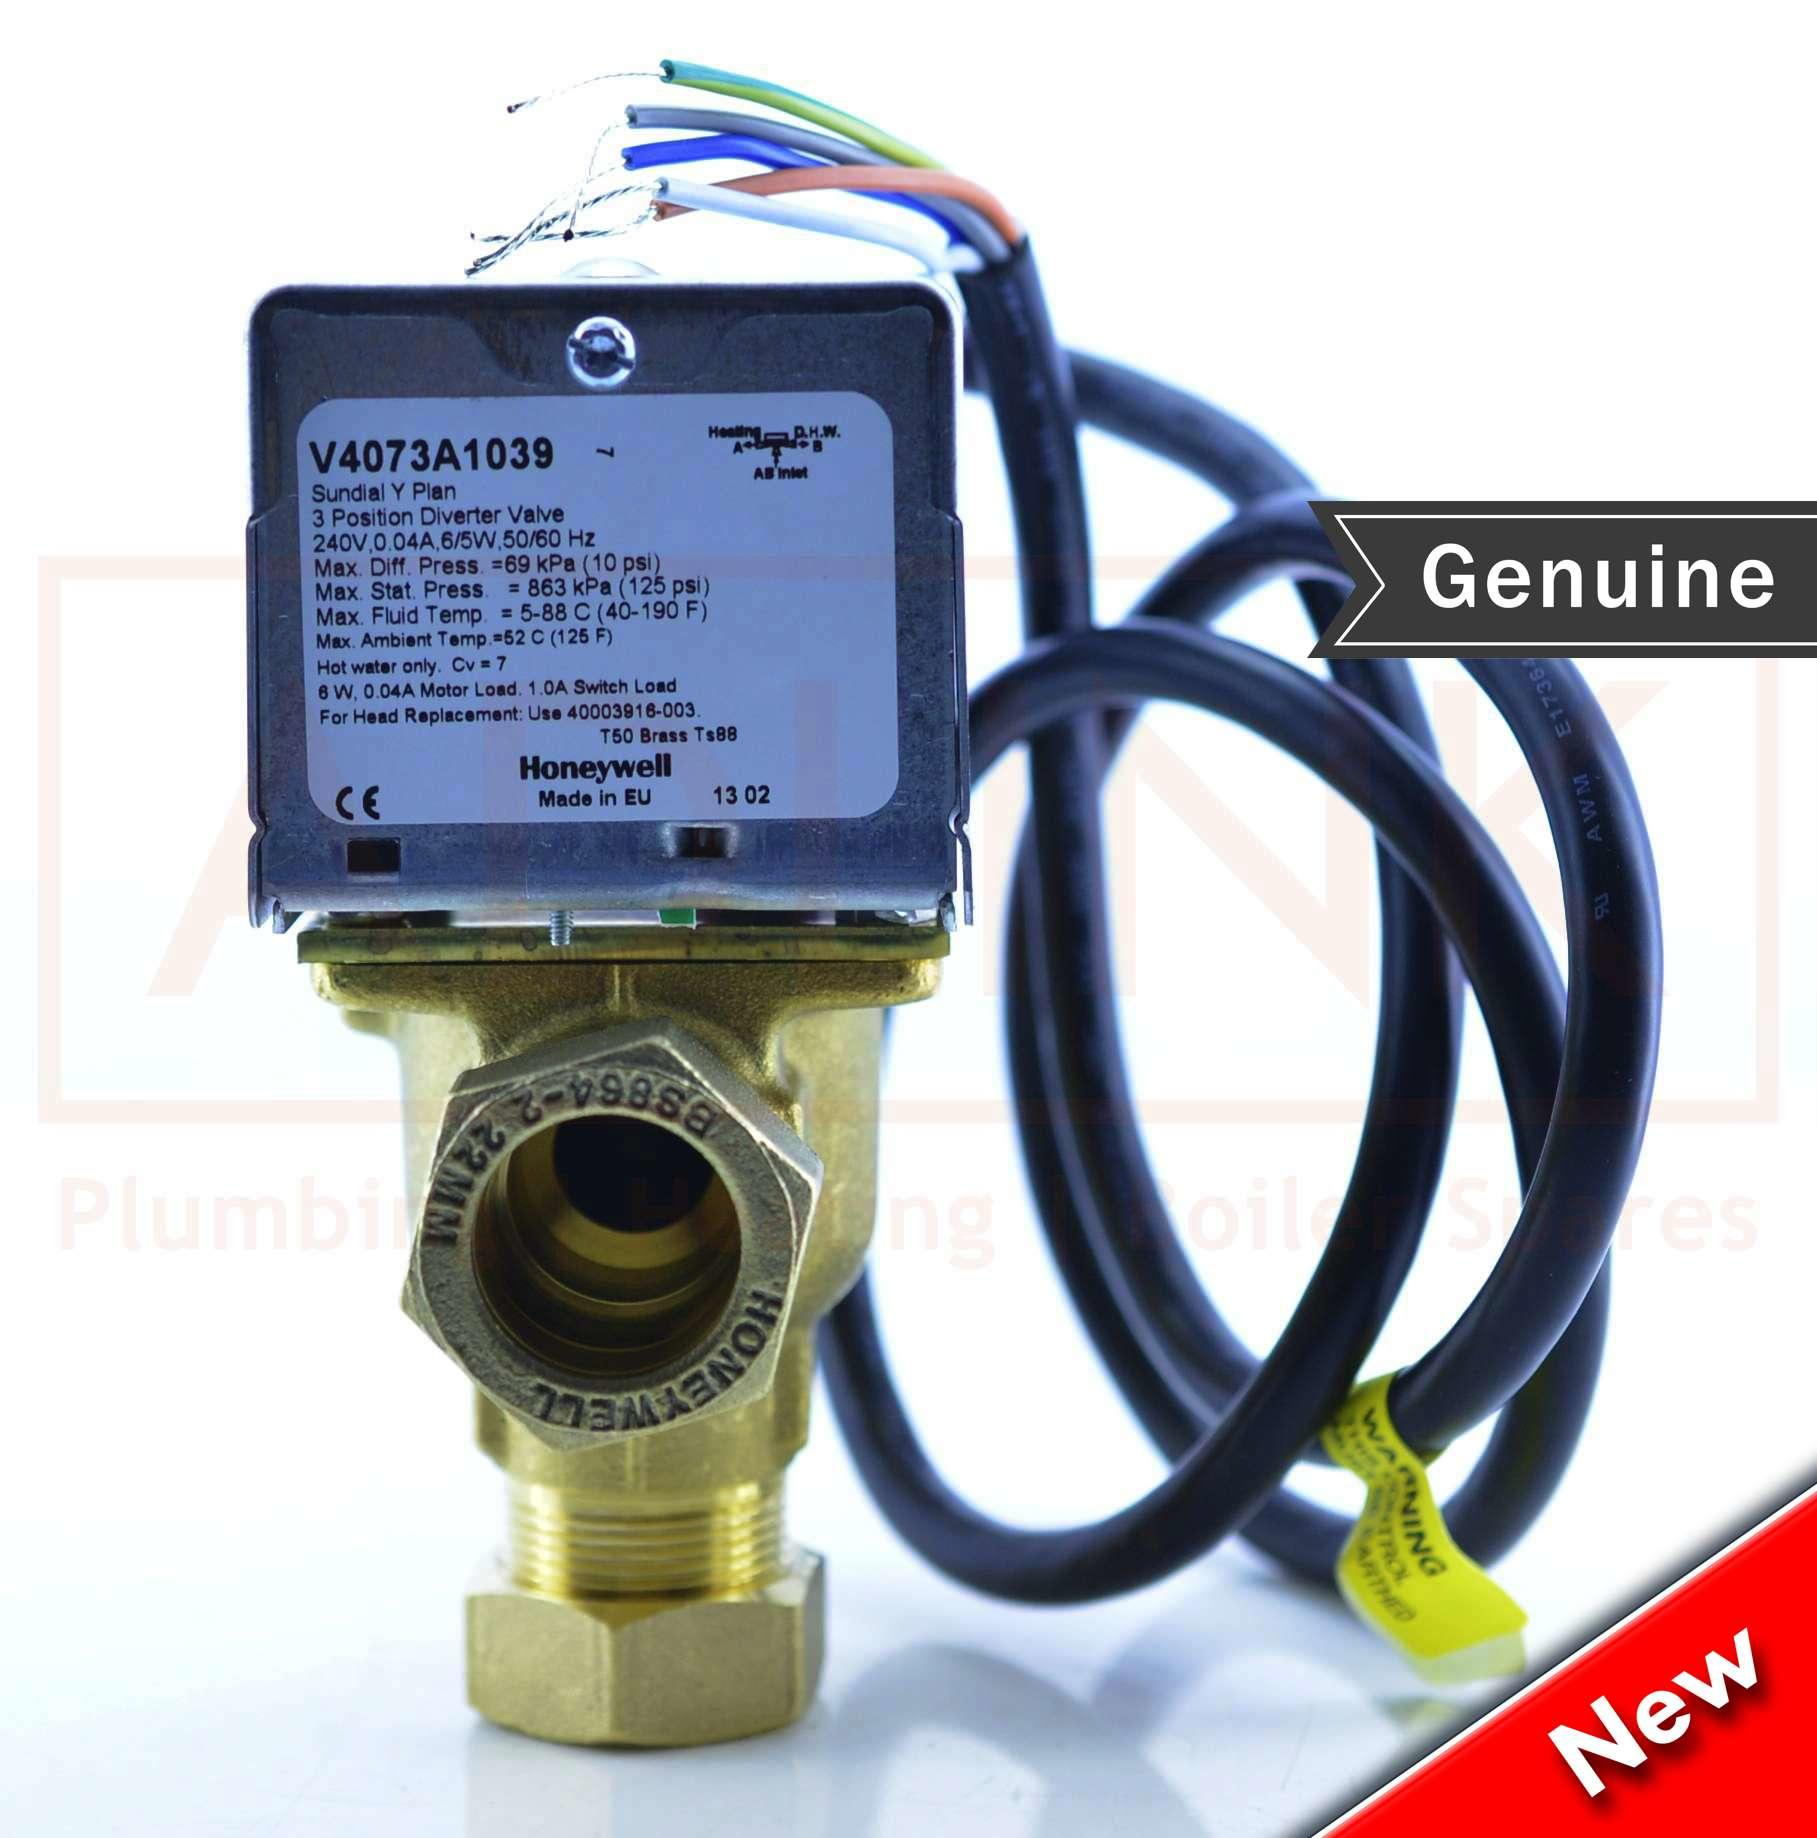 Honeywell 3 Port Valve 22mm 5 Wire  V4073a 1039